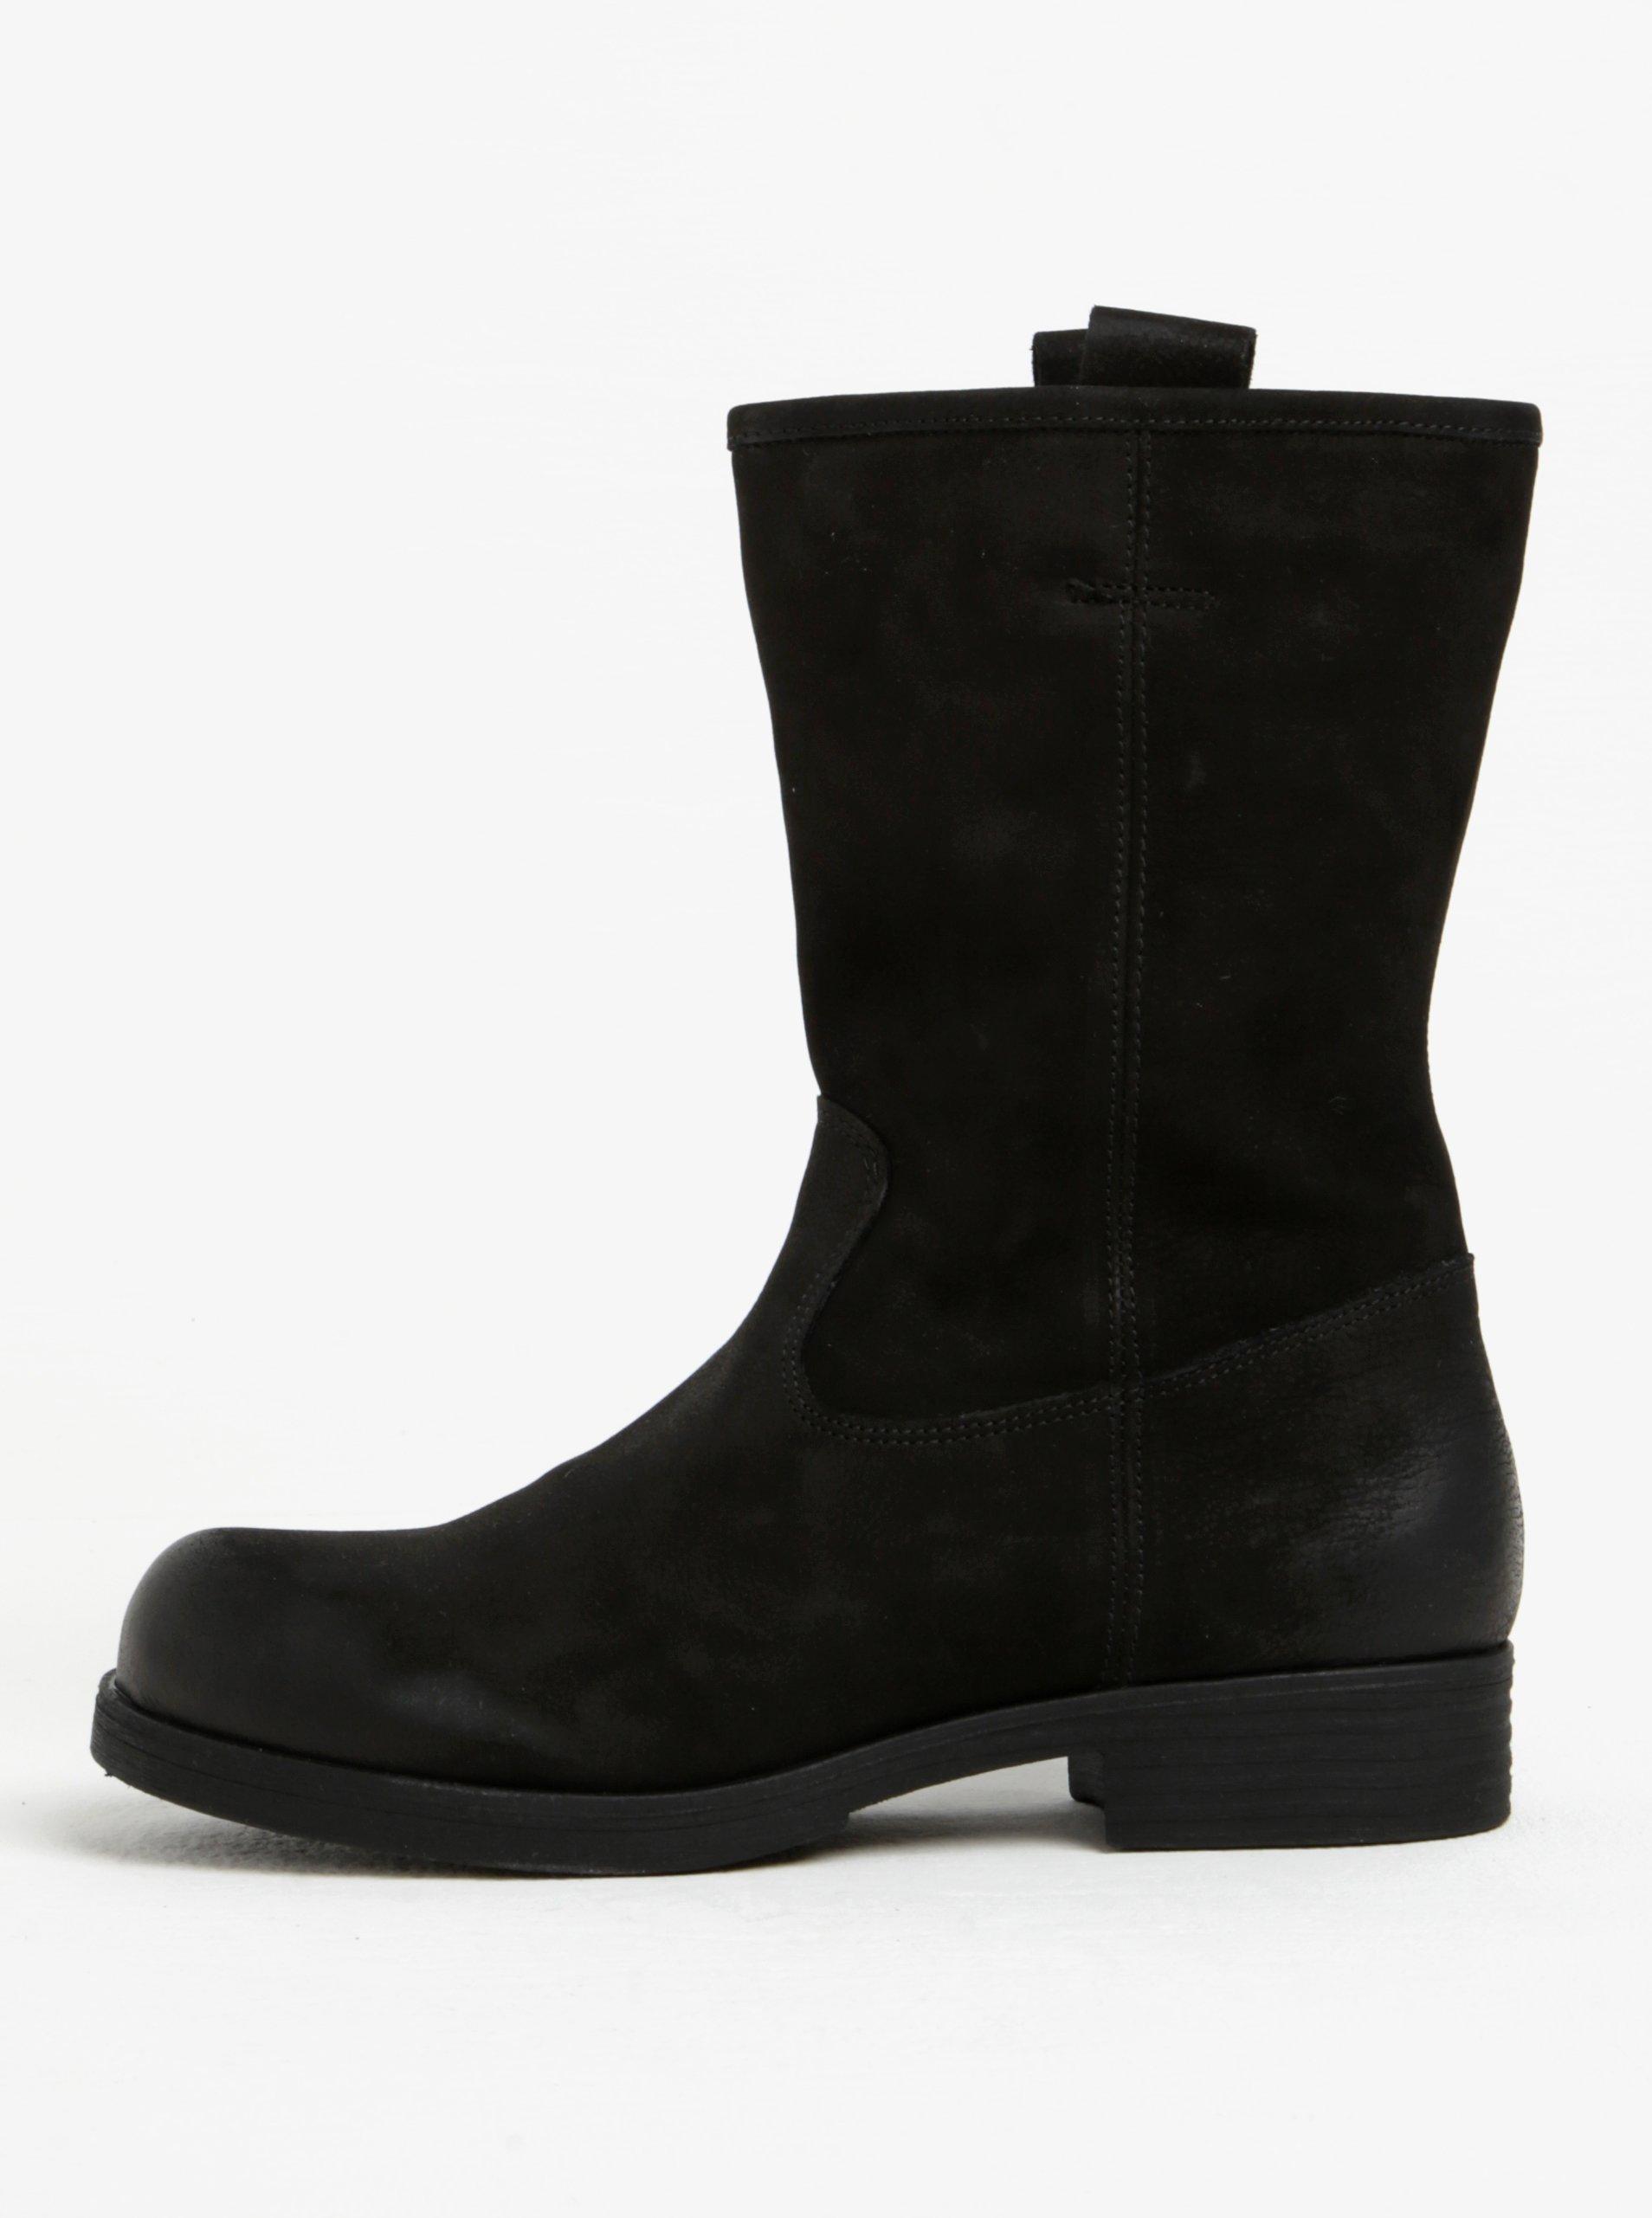 1823389ec Čierne dámske kožené nízke čižmy s.Oliver | Moda.sk